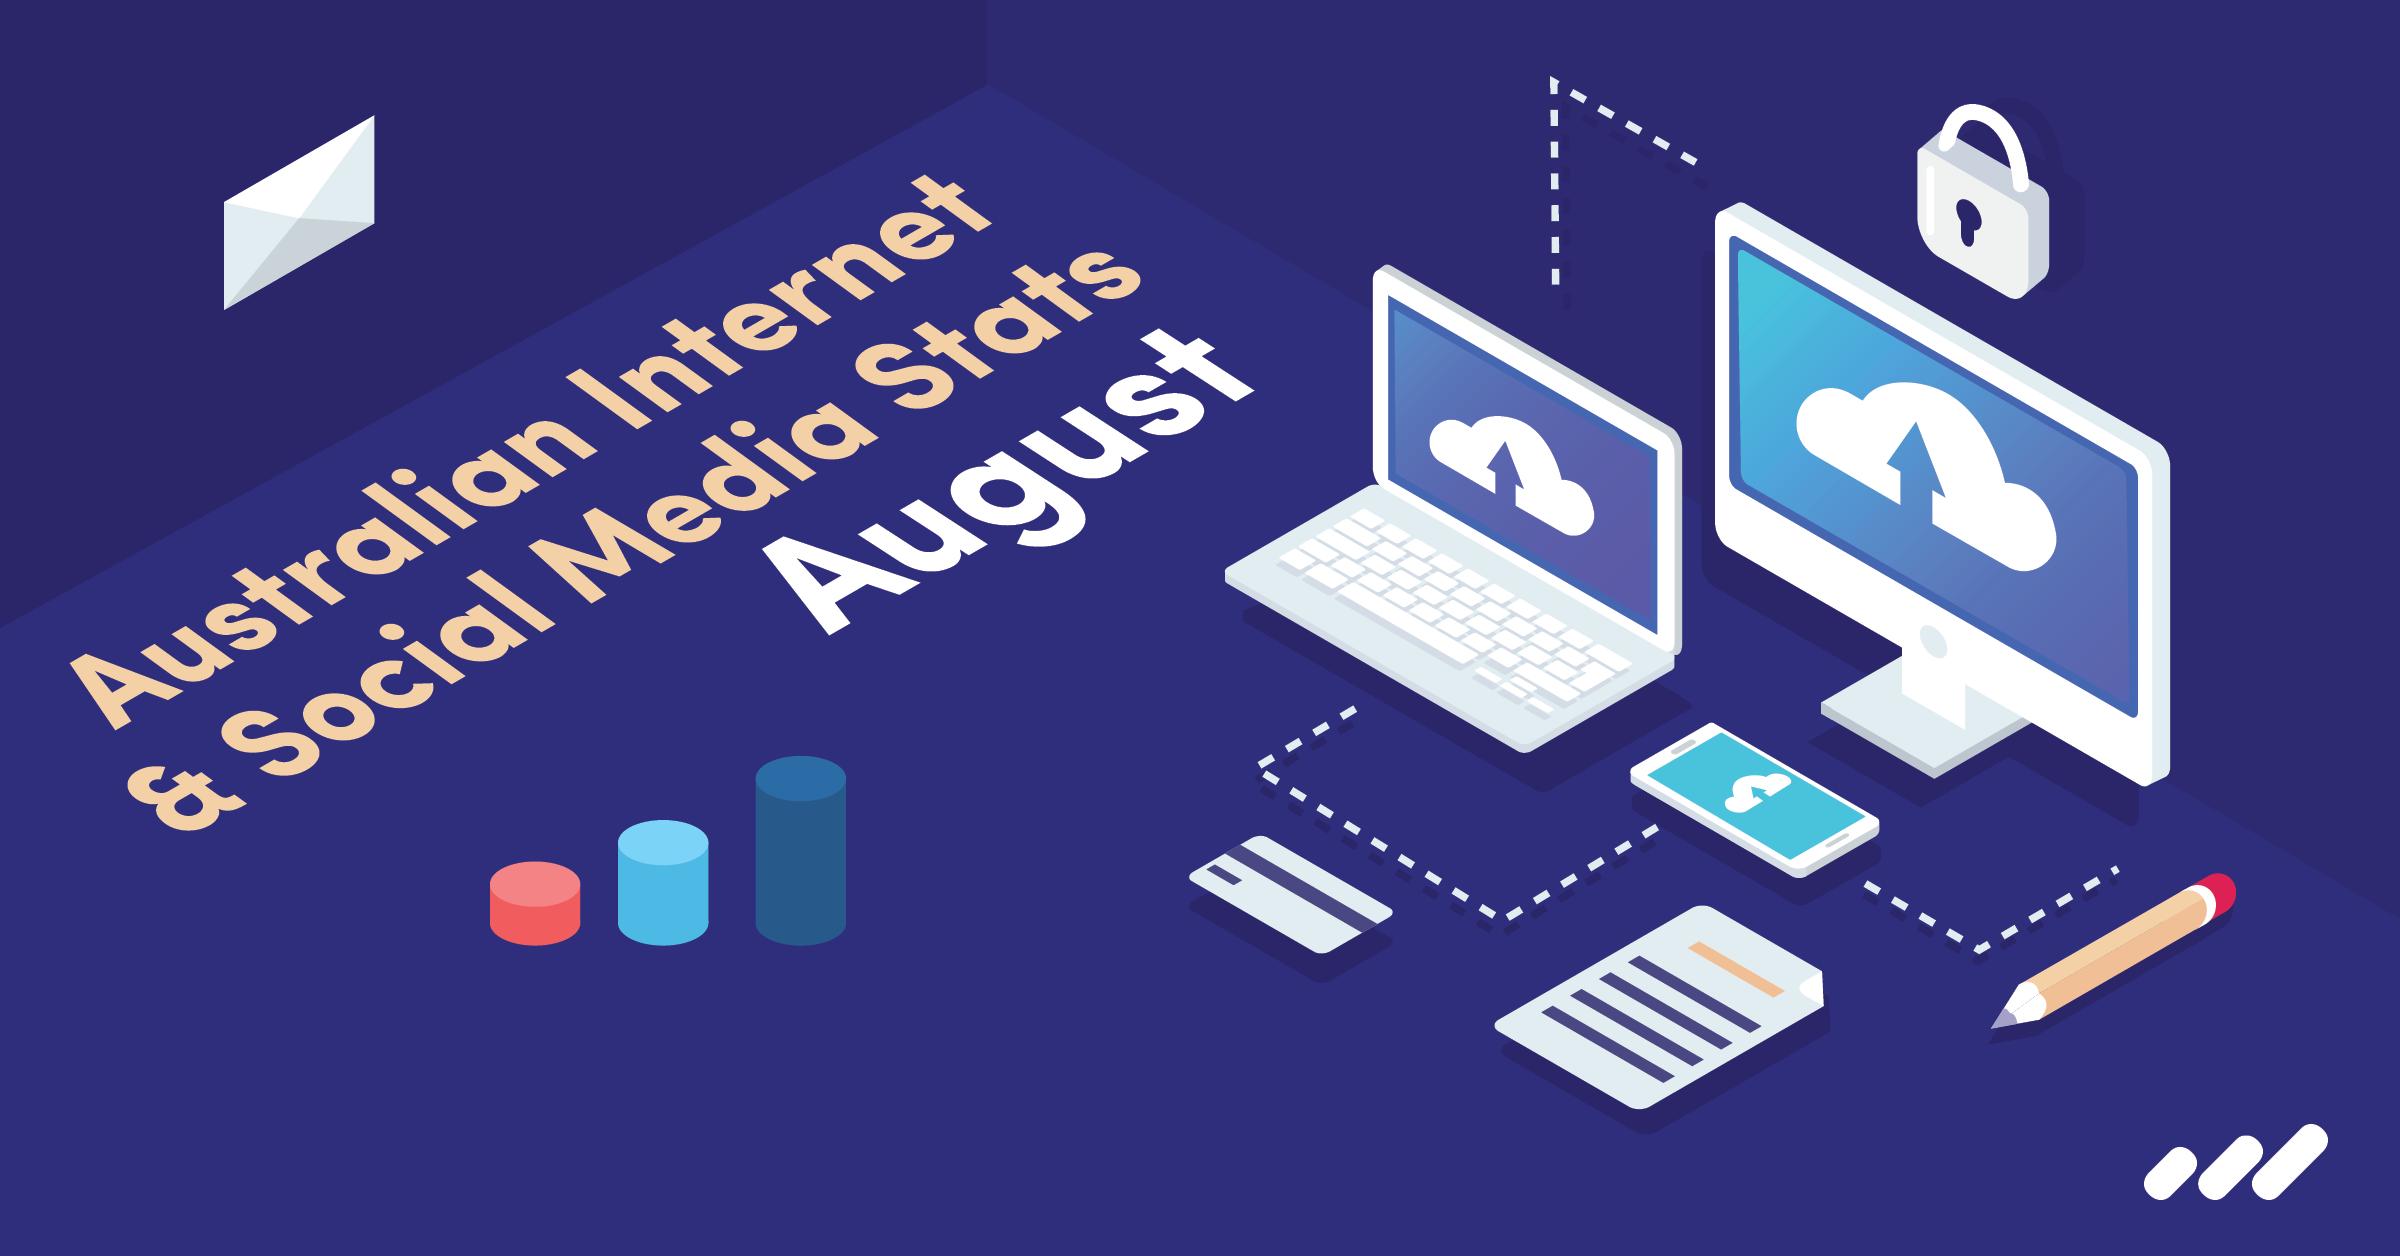 8-AustralianInternetSocialMediaStats-August